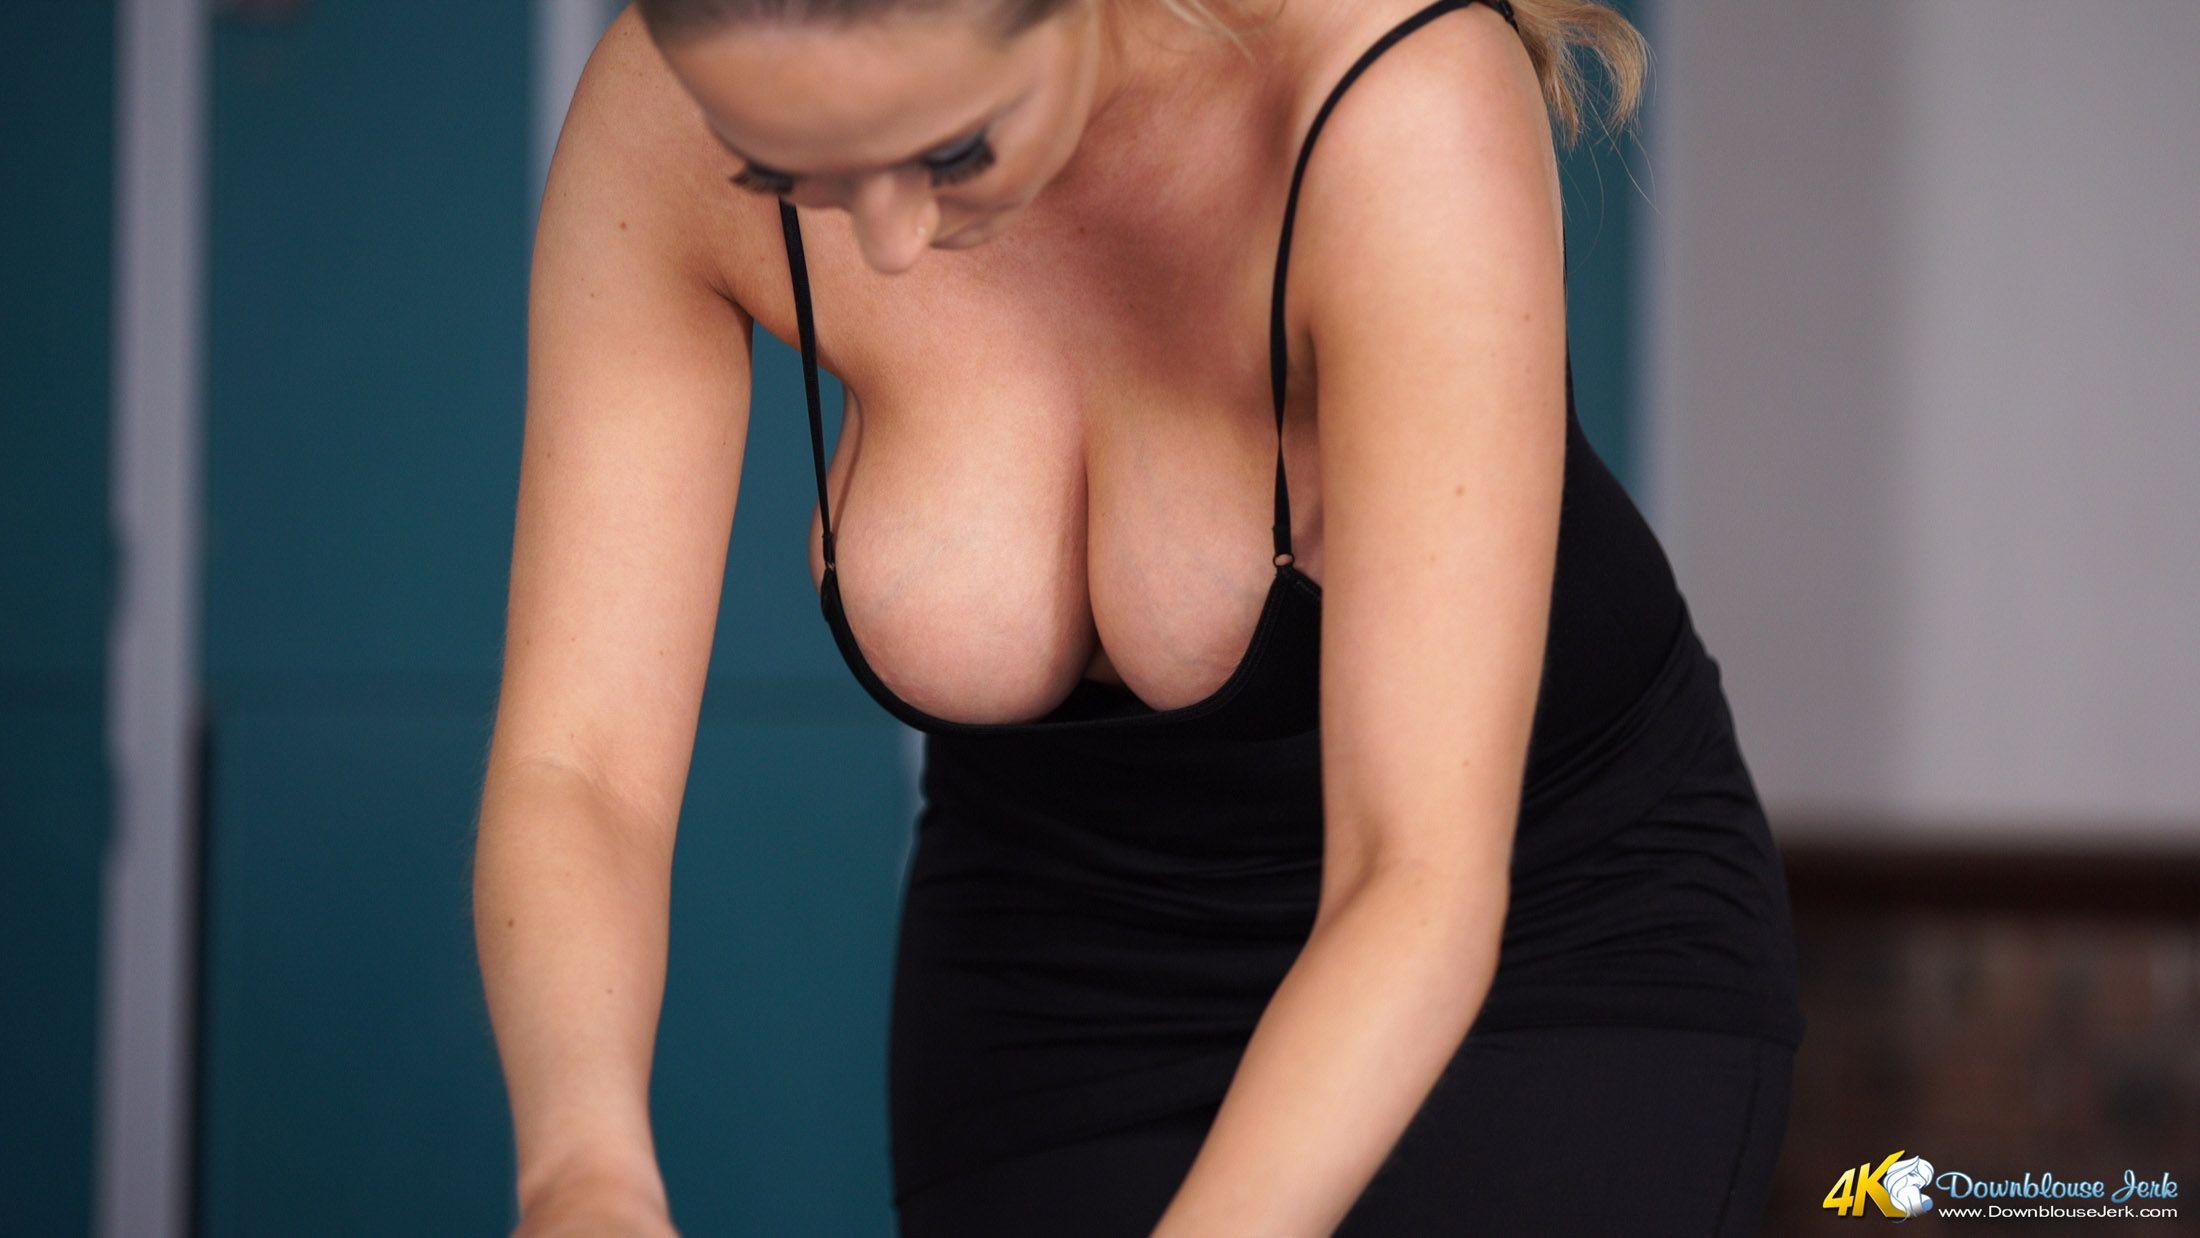 Cleavages LowCut Tops Bending Over  Low cut top  Big tits big boobs bouncing boobs huge